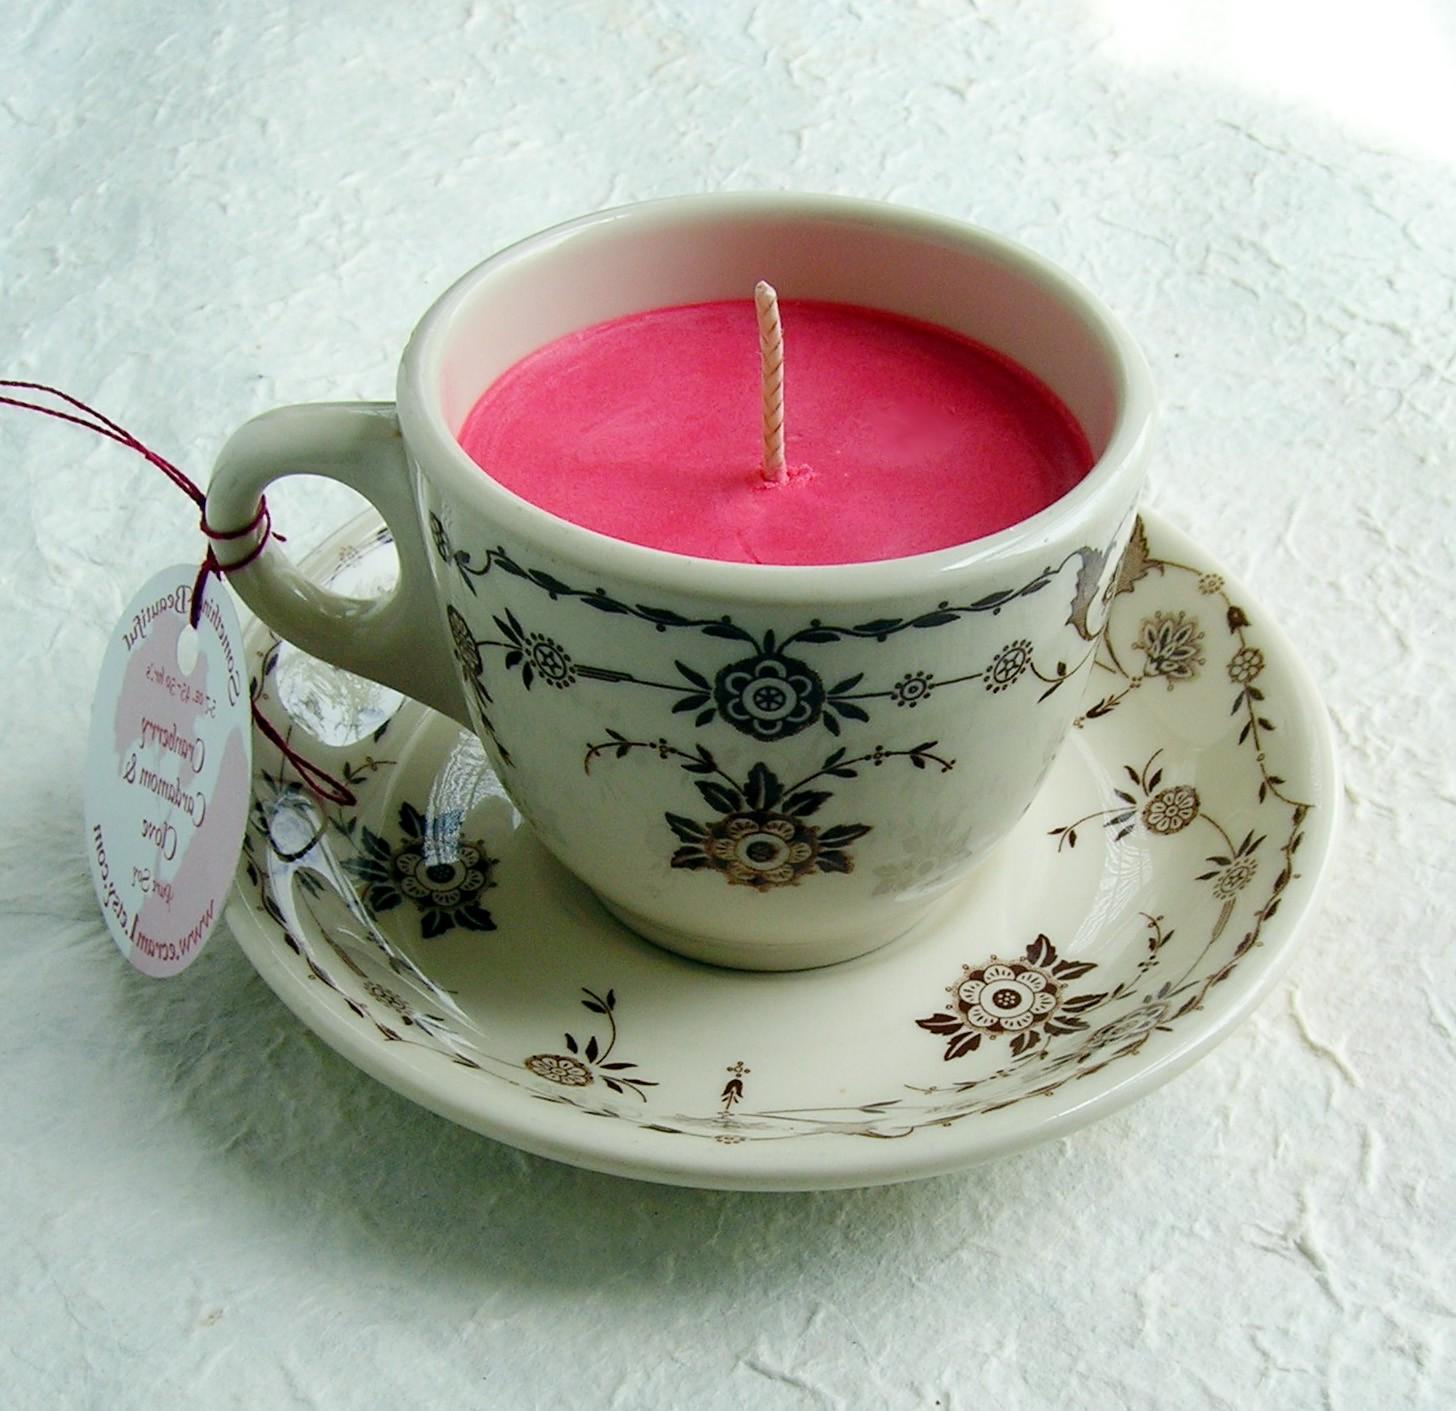 Repurposing old tea cups can